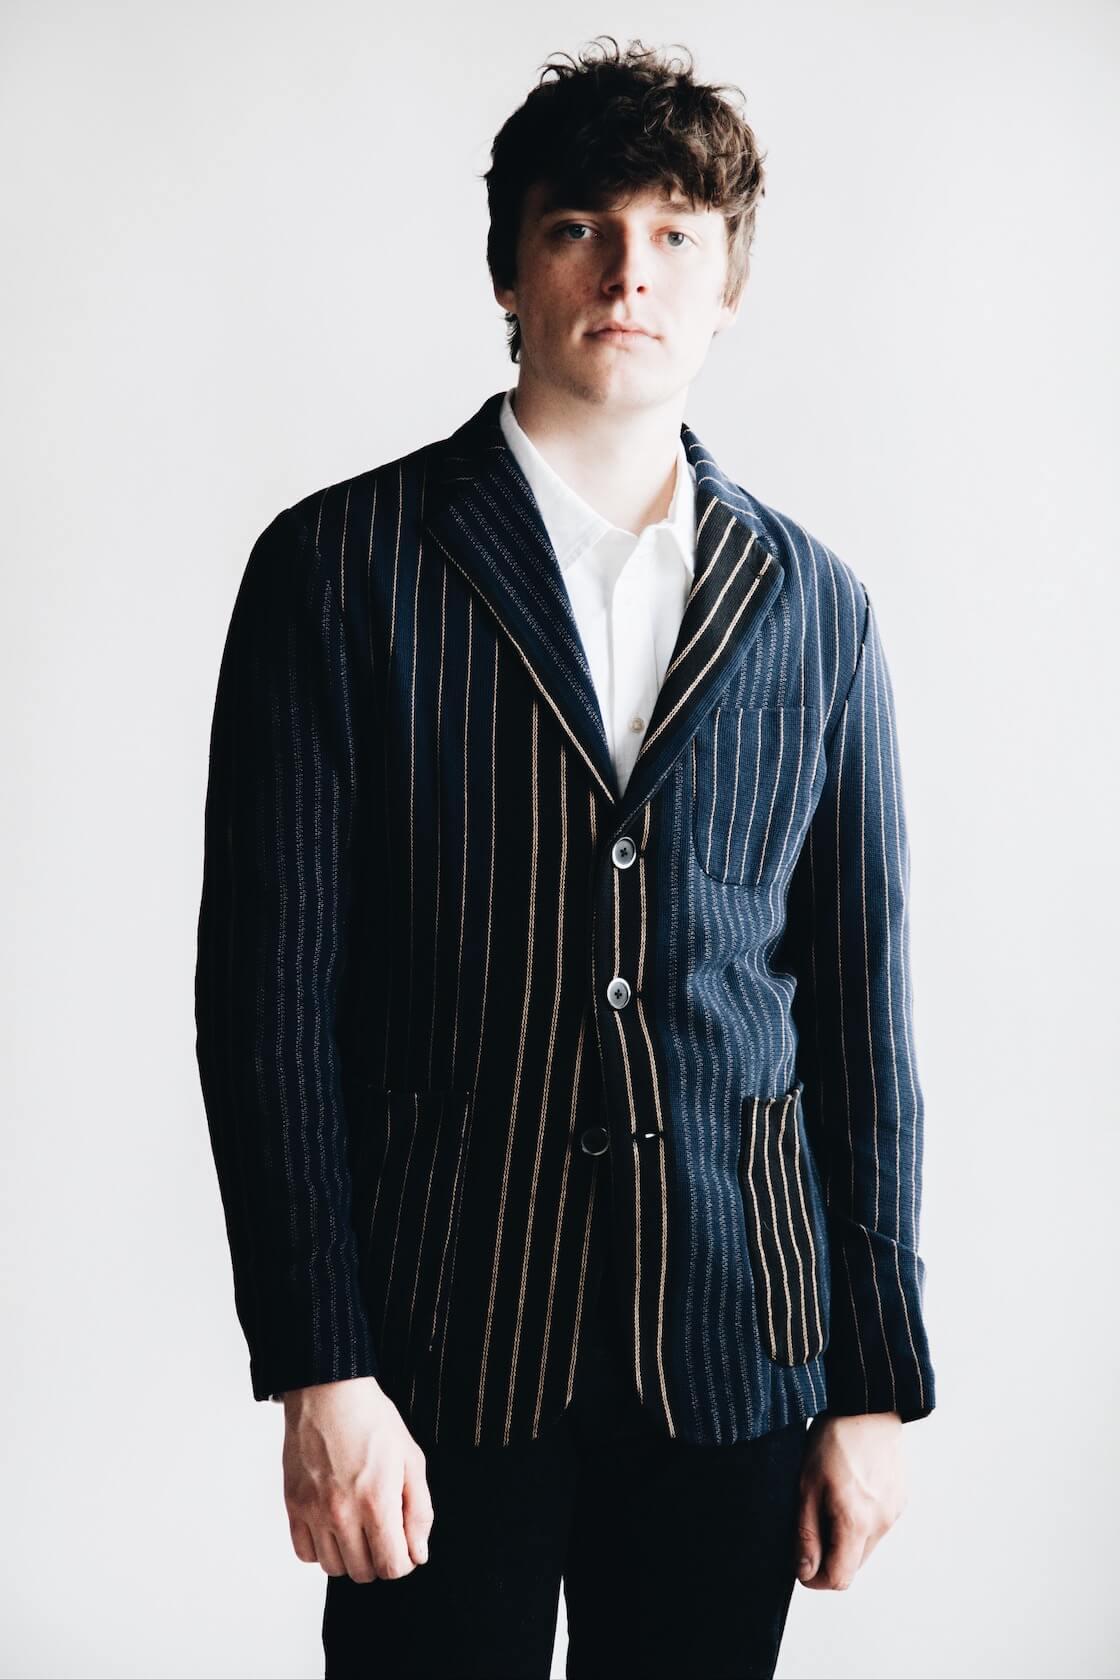 Barena Torceo Jacket, Canoe club x corridor nyc oxford shirt, and tanuki nt denim on body